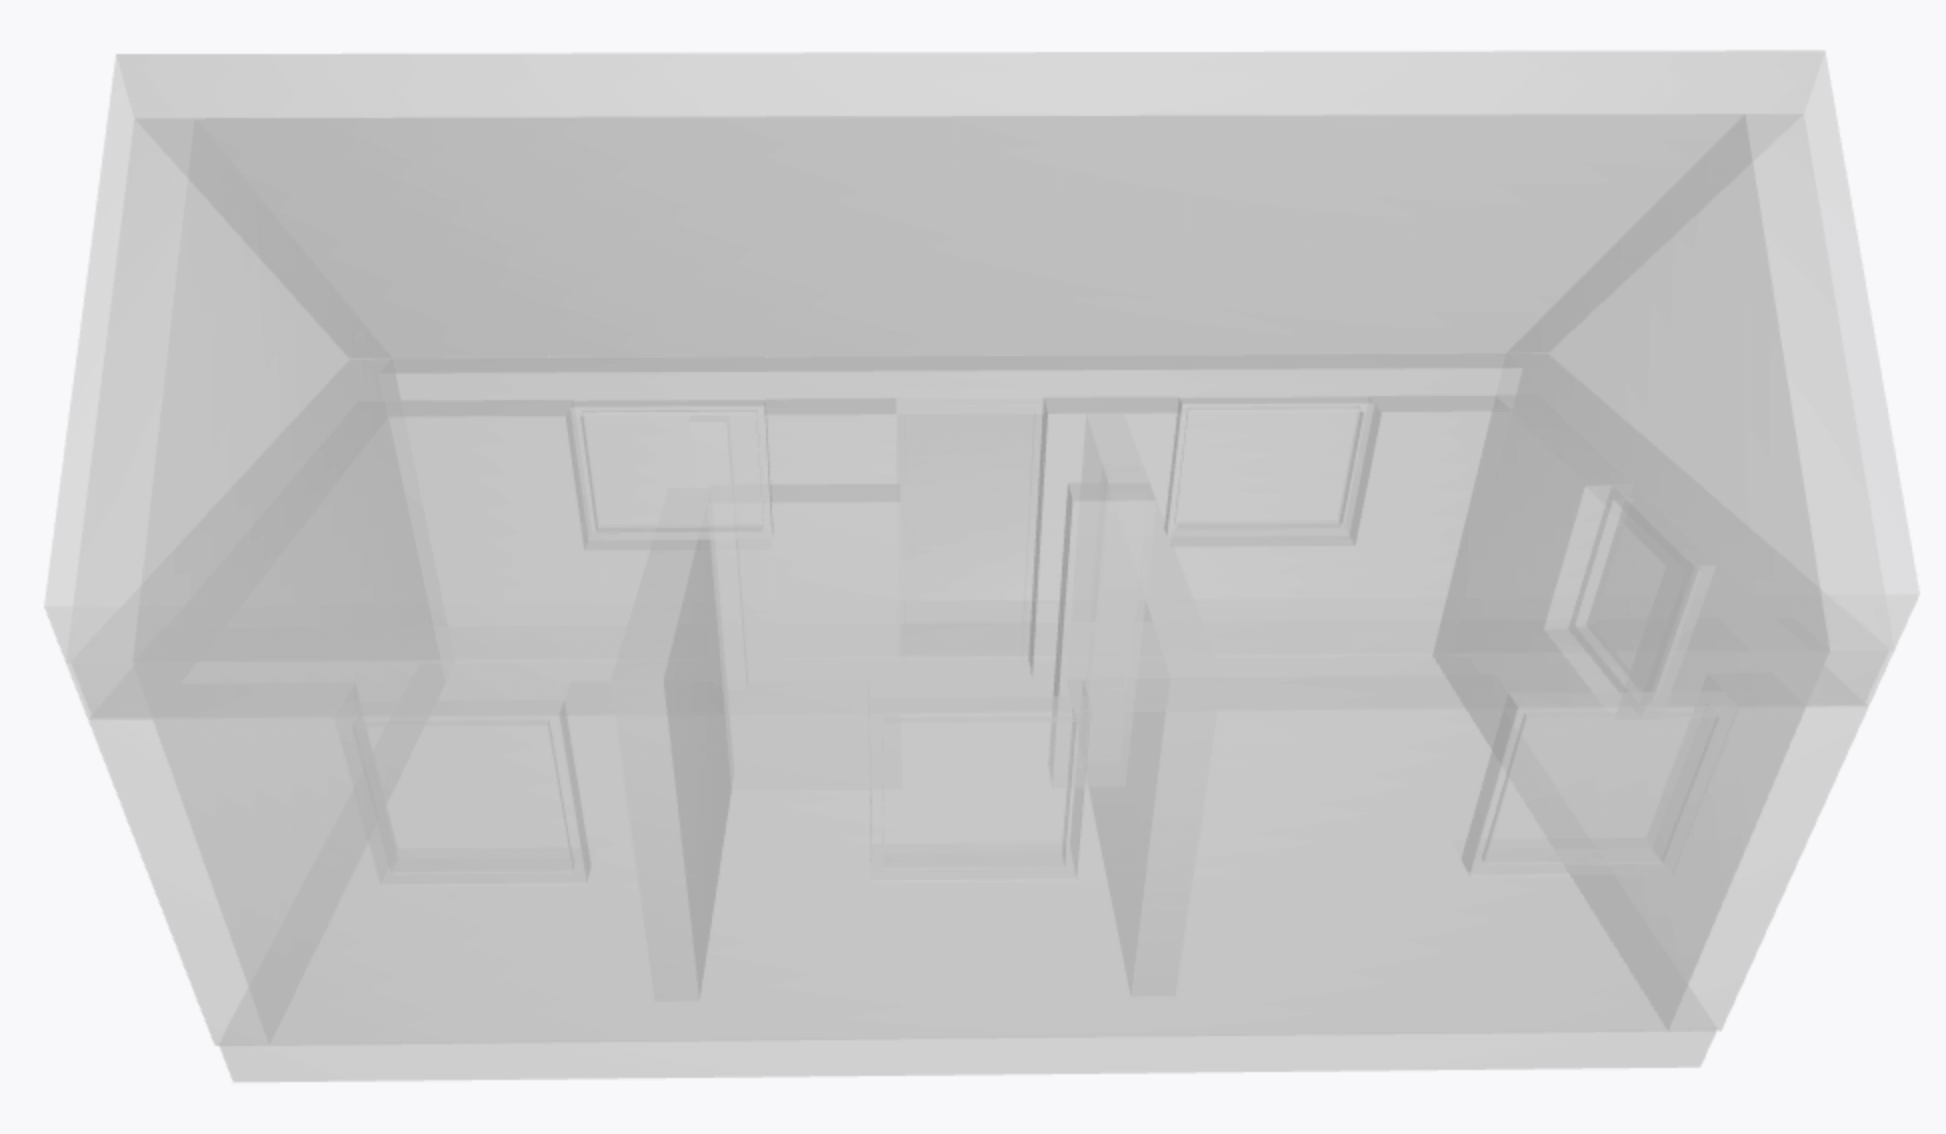 3D-modell av ett uppritat attefallshus